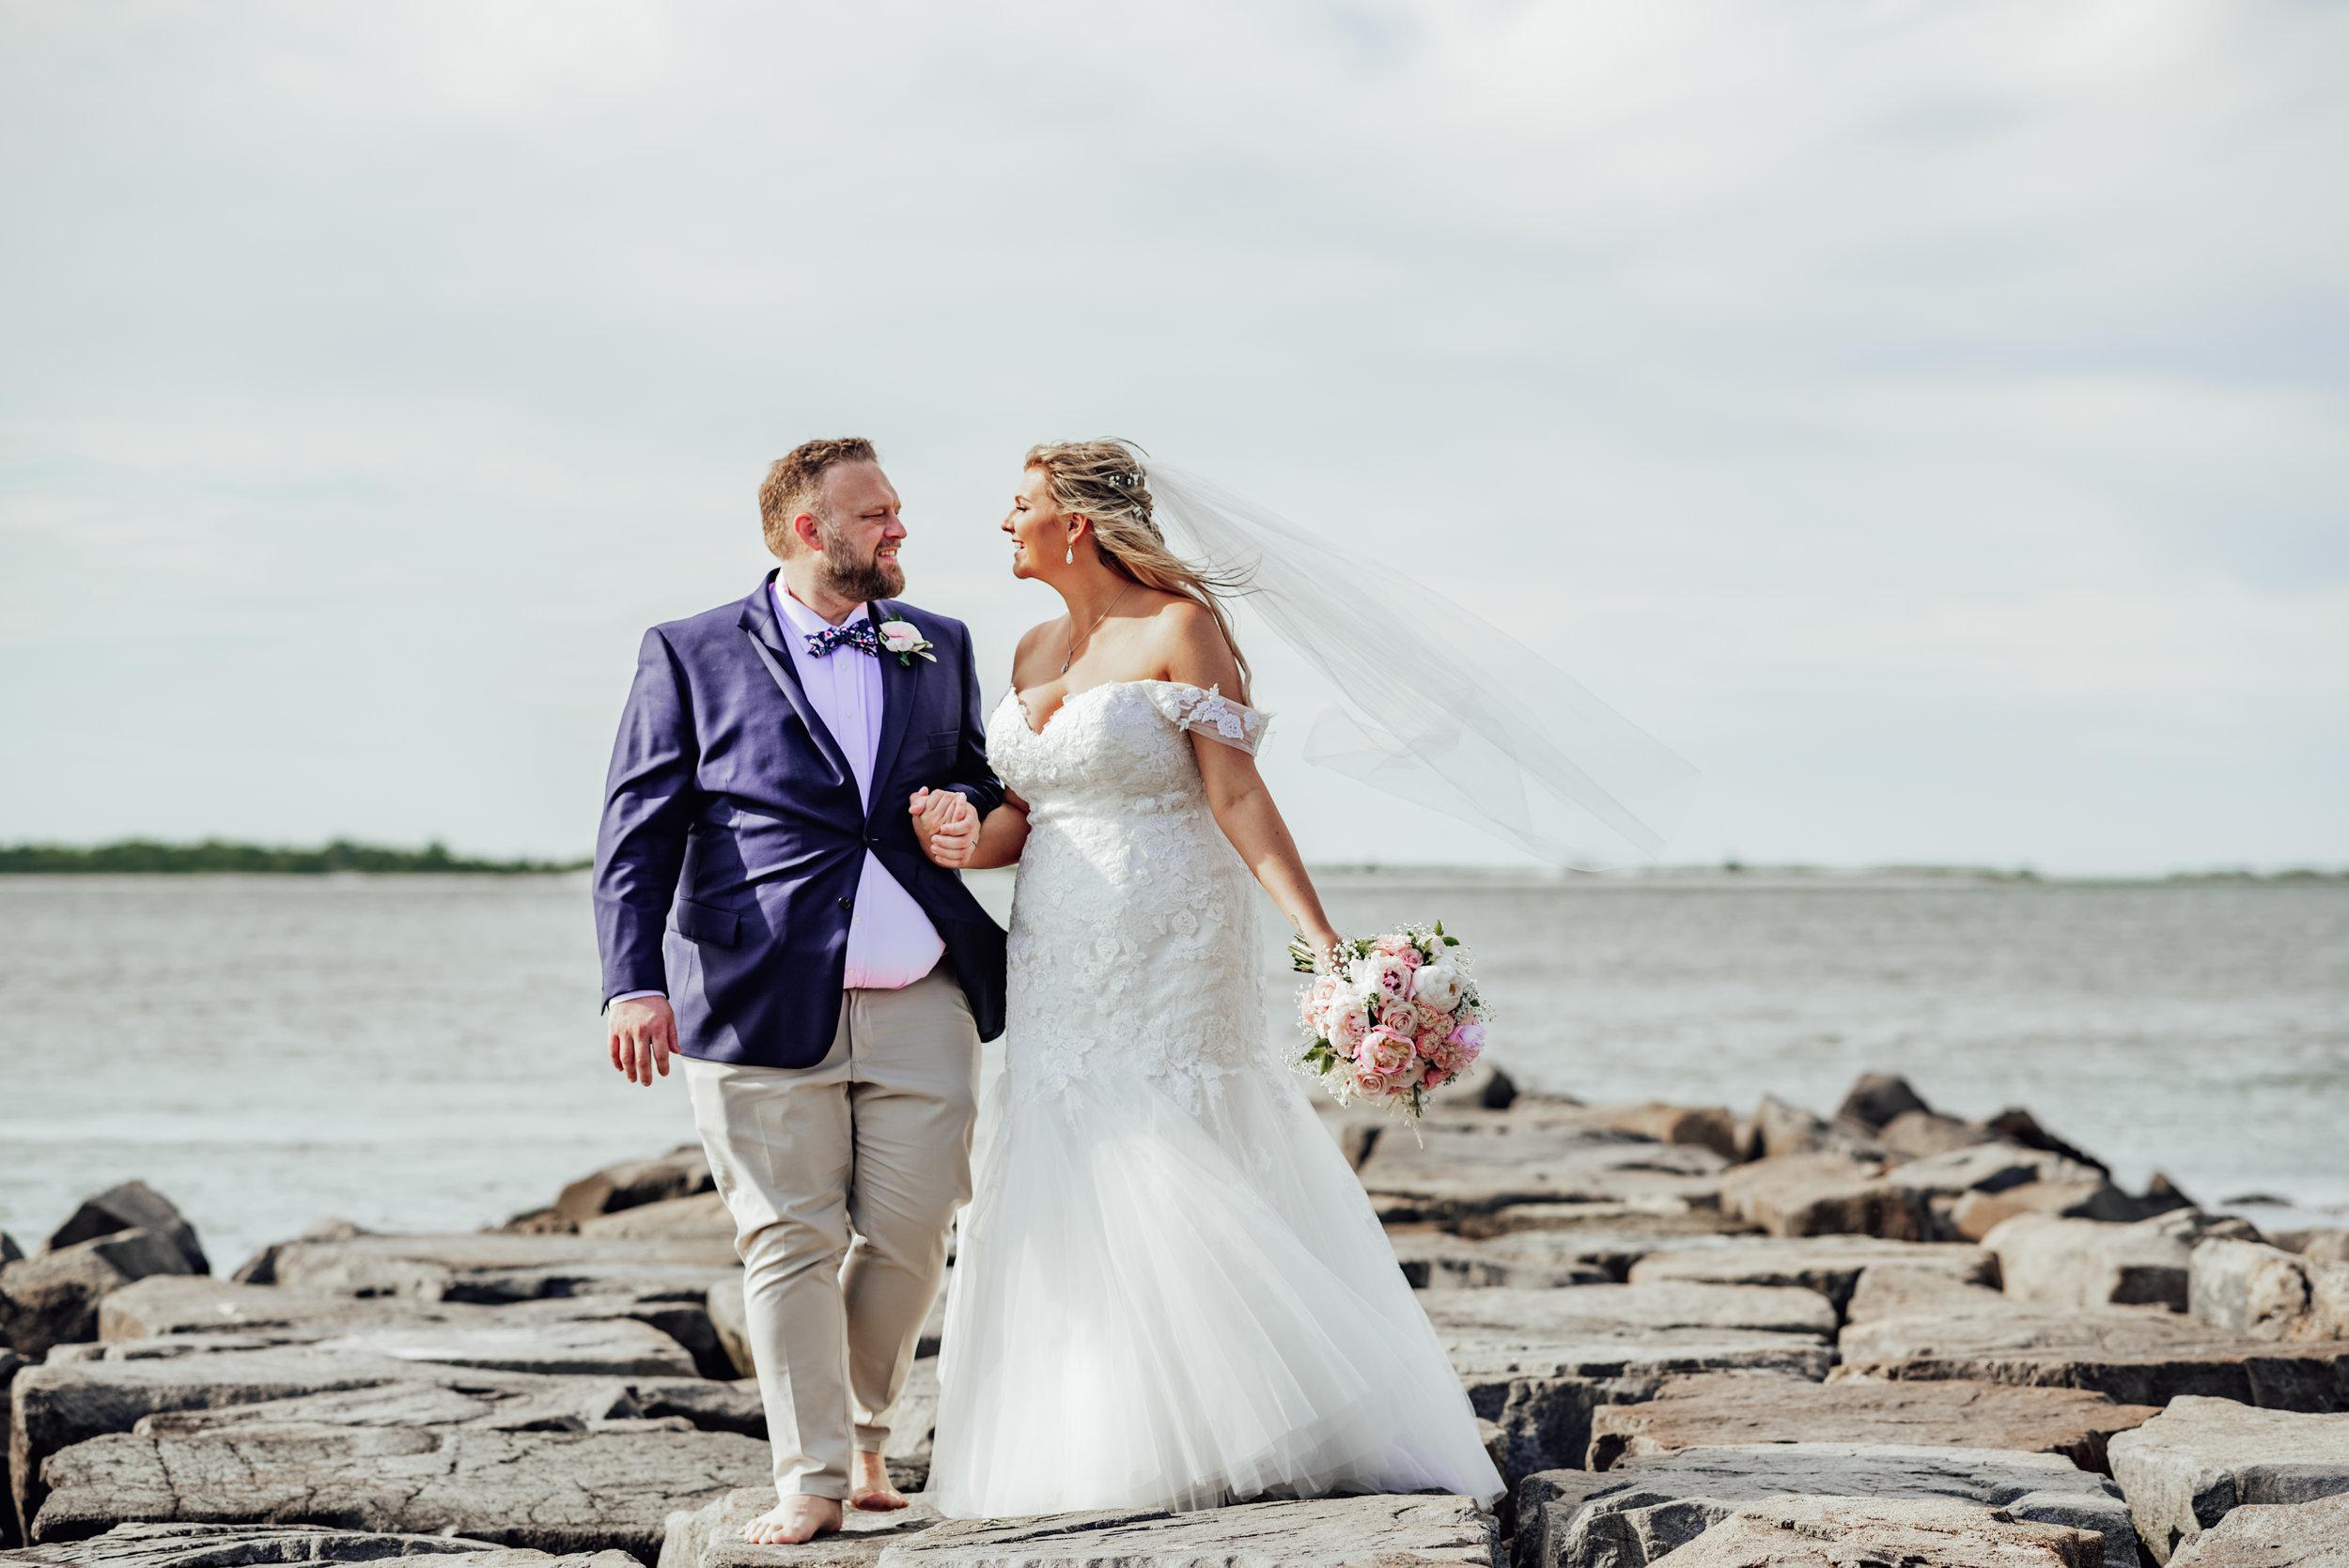 New Jersey Wedding Photographer, Felsberg Photography LBI wedding photography 80.jpg